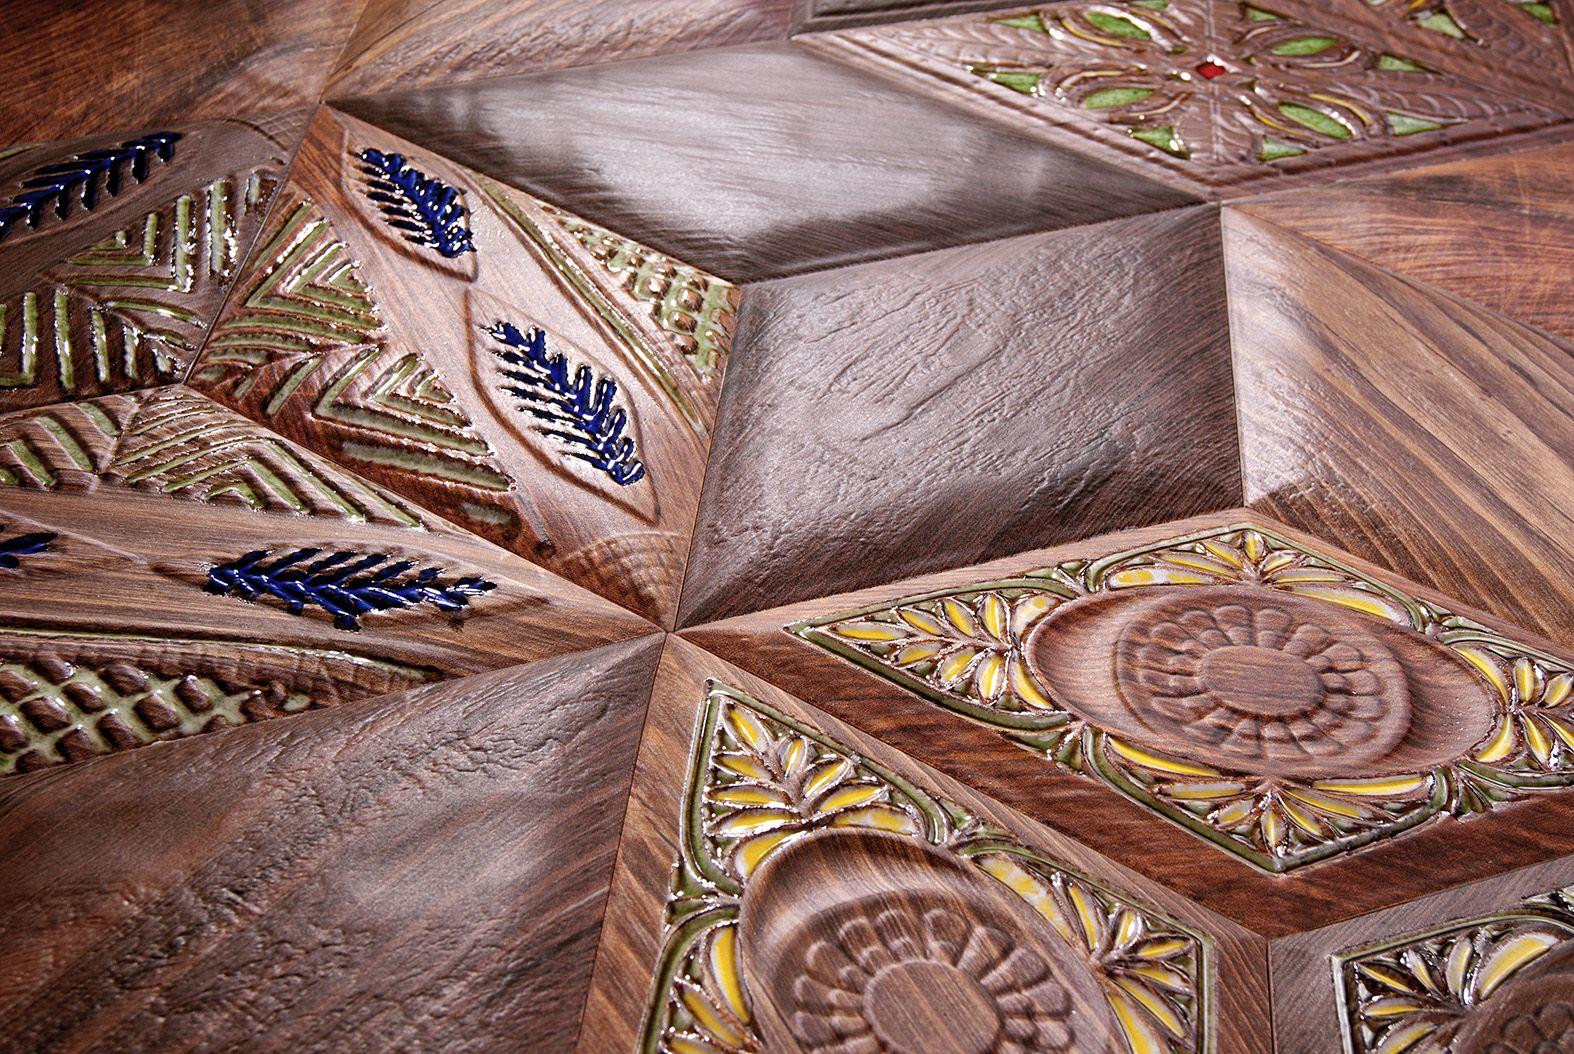 Ceramic Relieff Wood Relieve Ceramico Con Acabado Madera